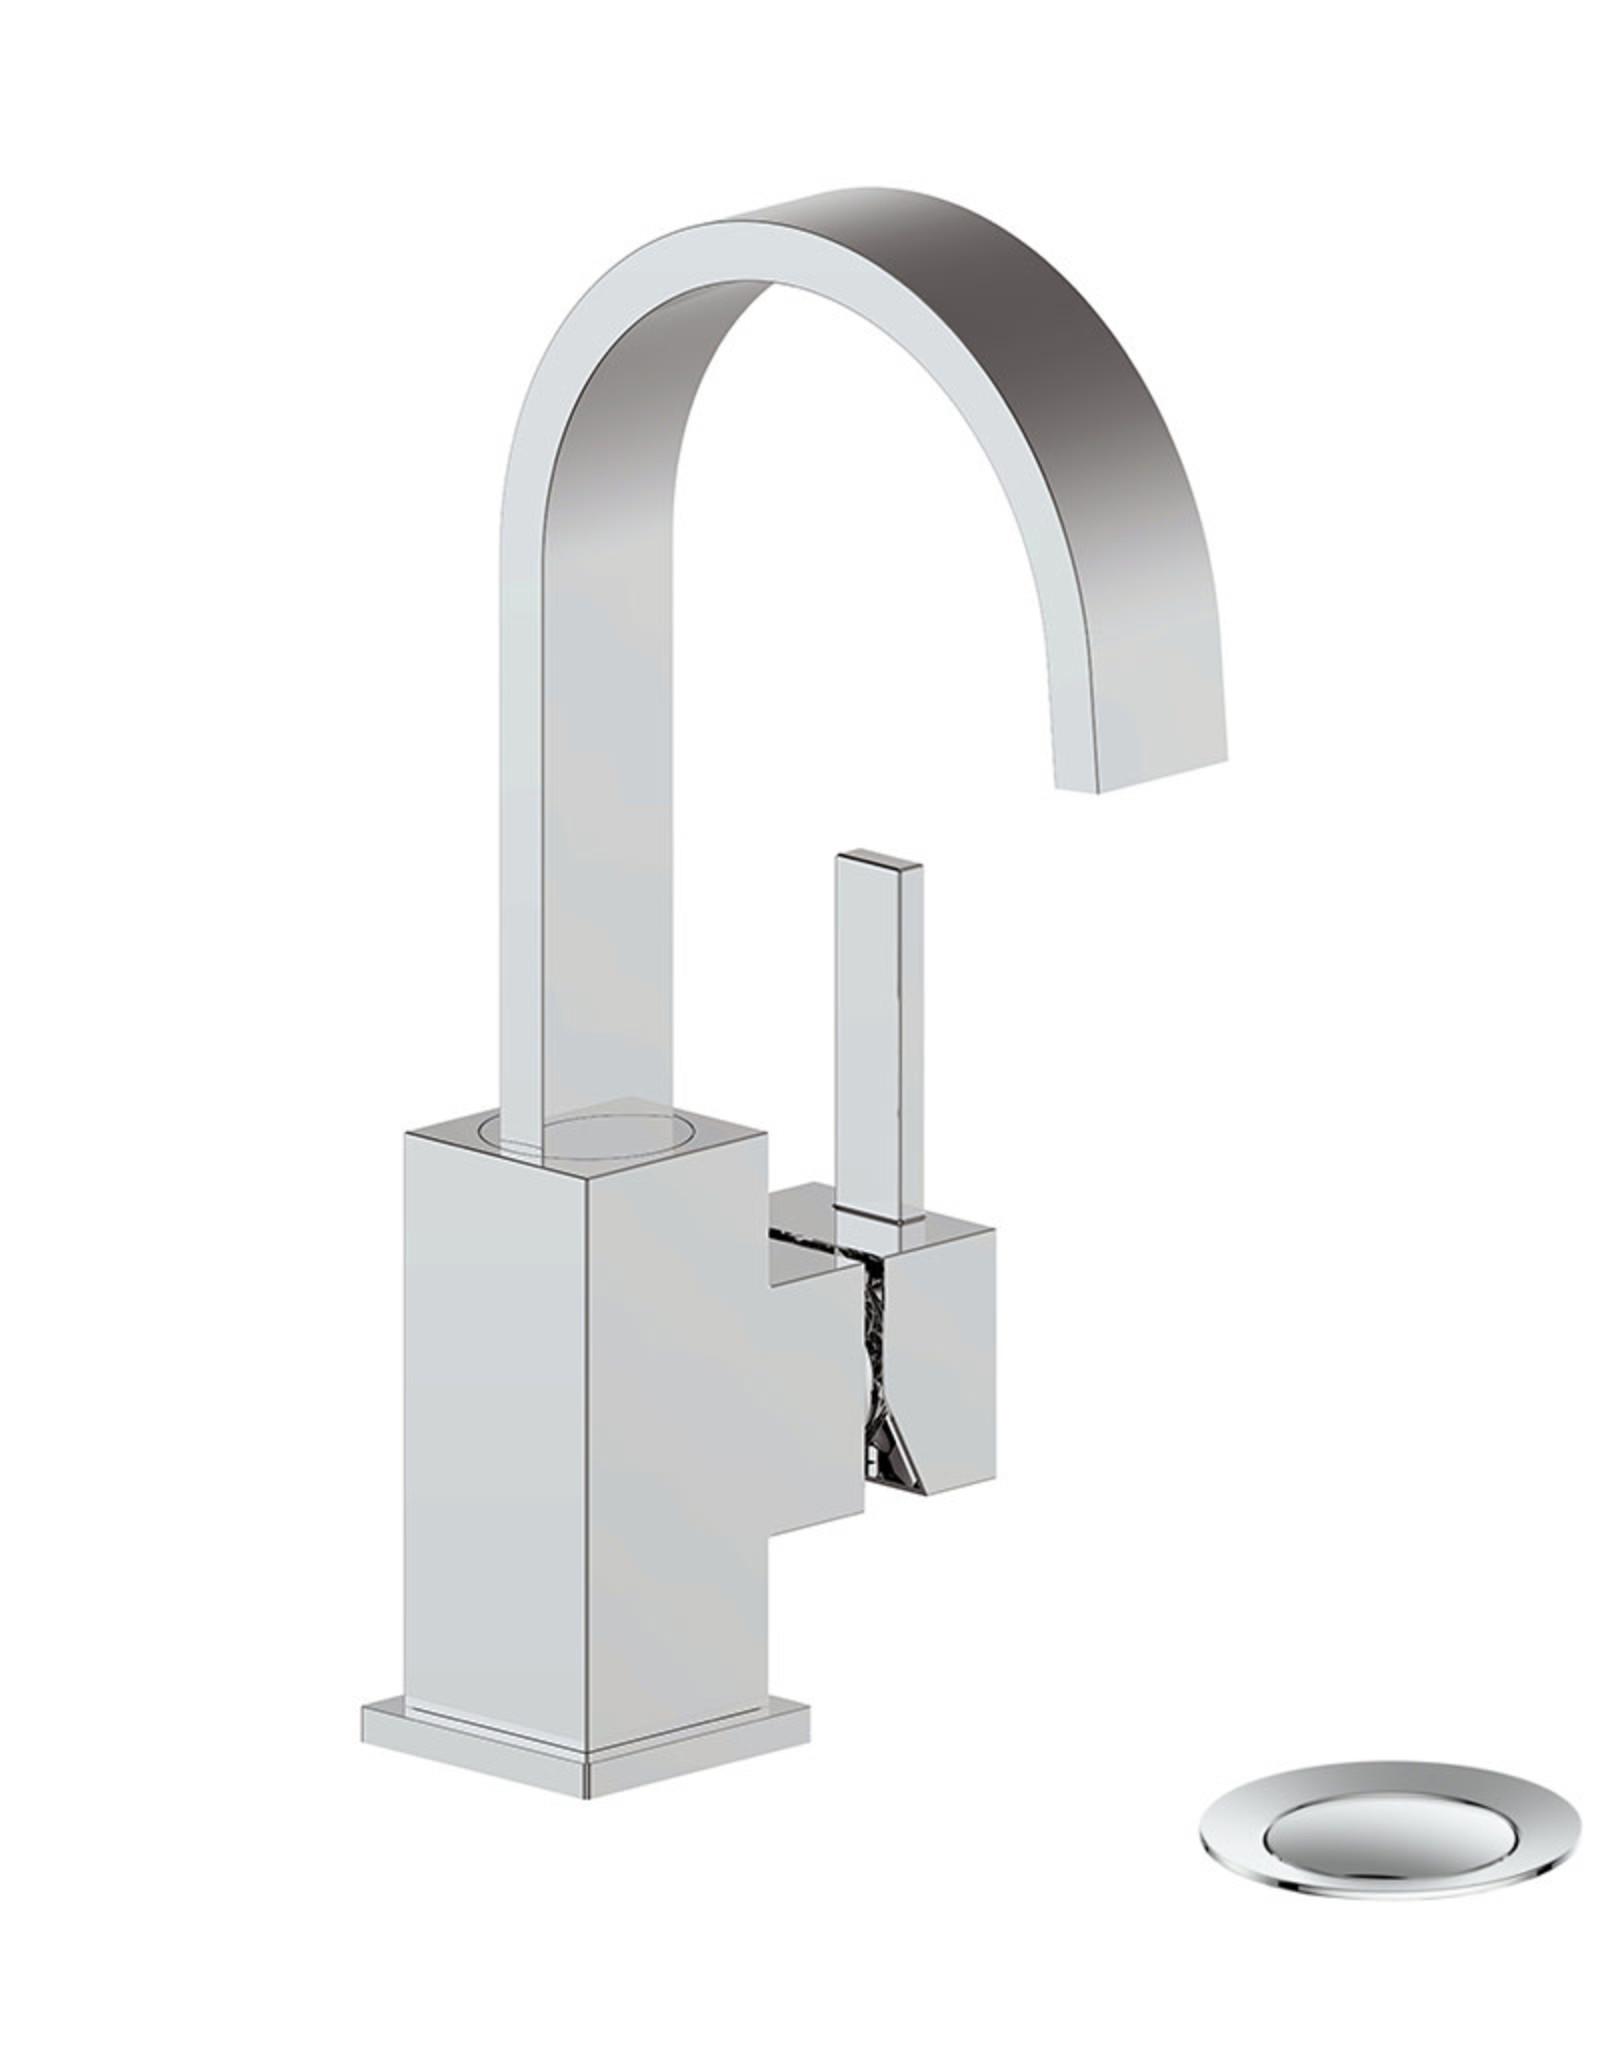 Vogt Kapfenberg II- Single Hole Lav Faucet- Chrome